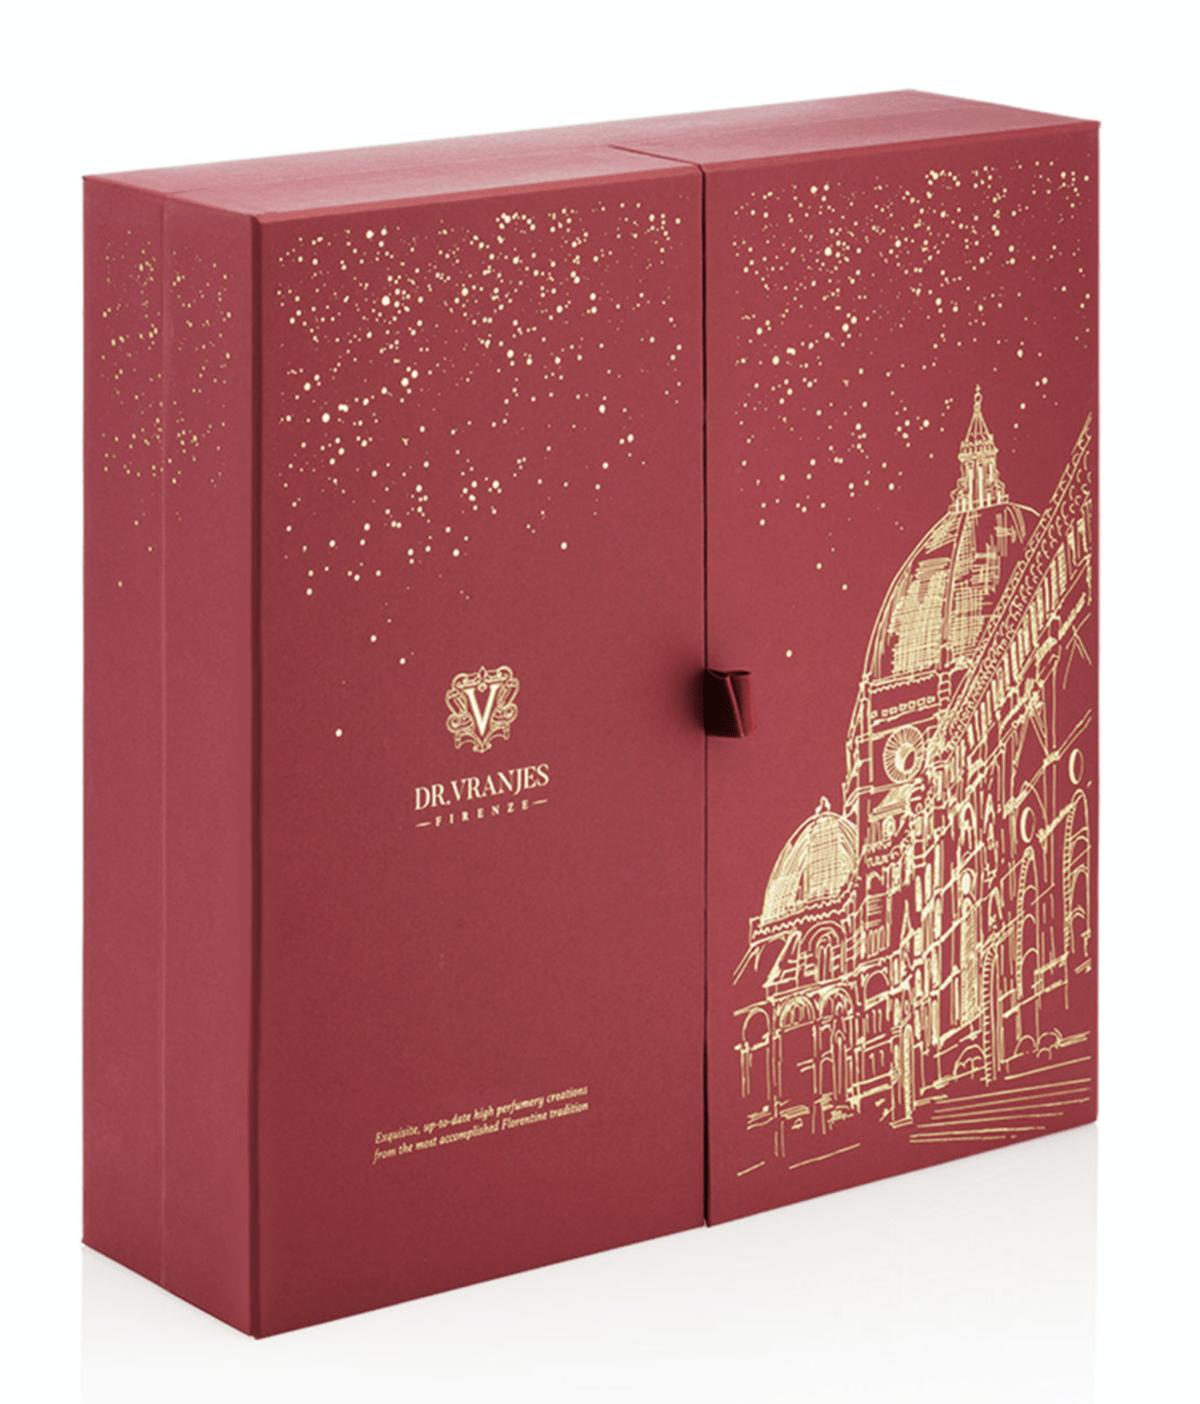 Dr. Vranjes Firenze Advent Calendar – On Sale Now